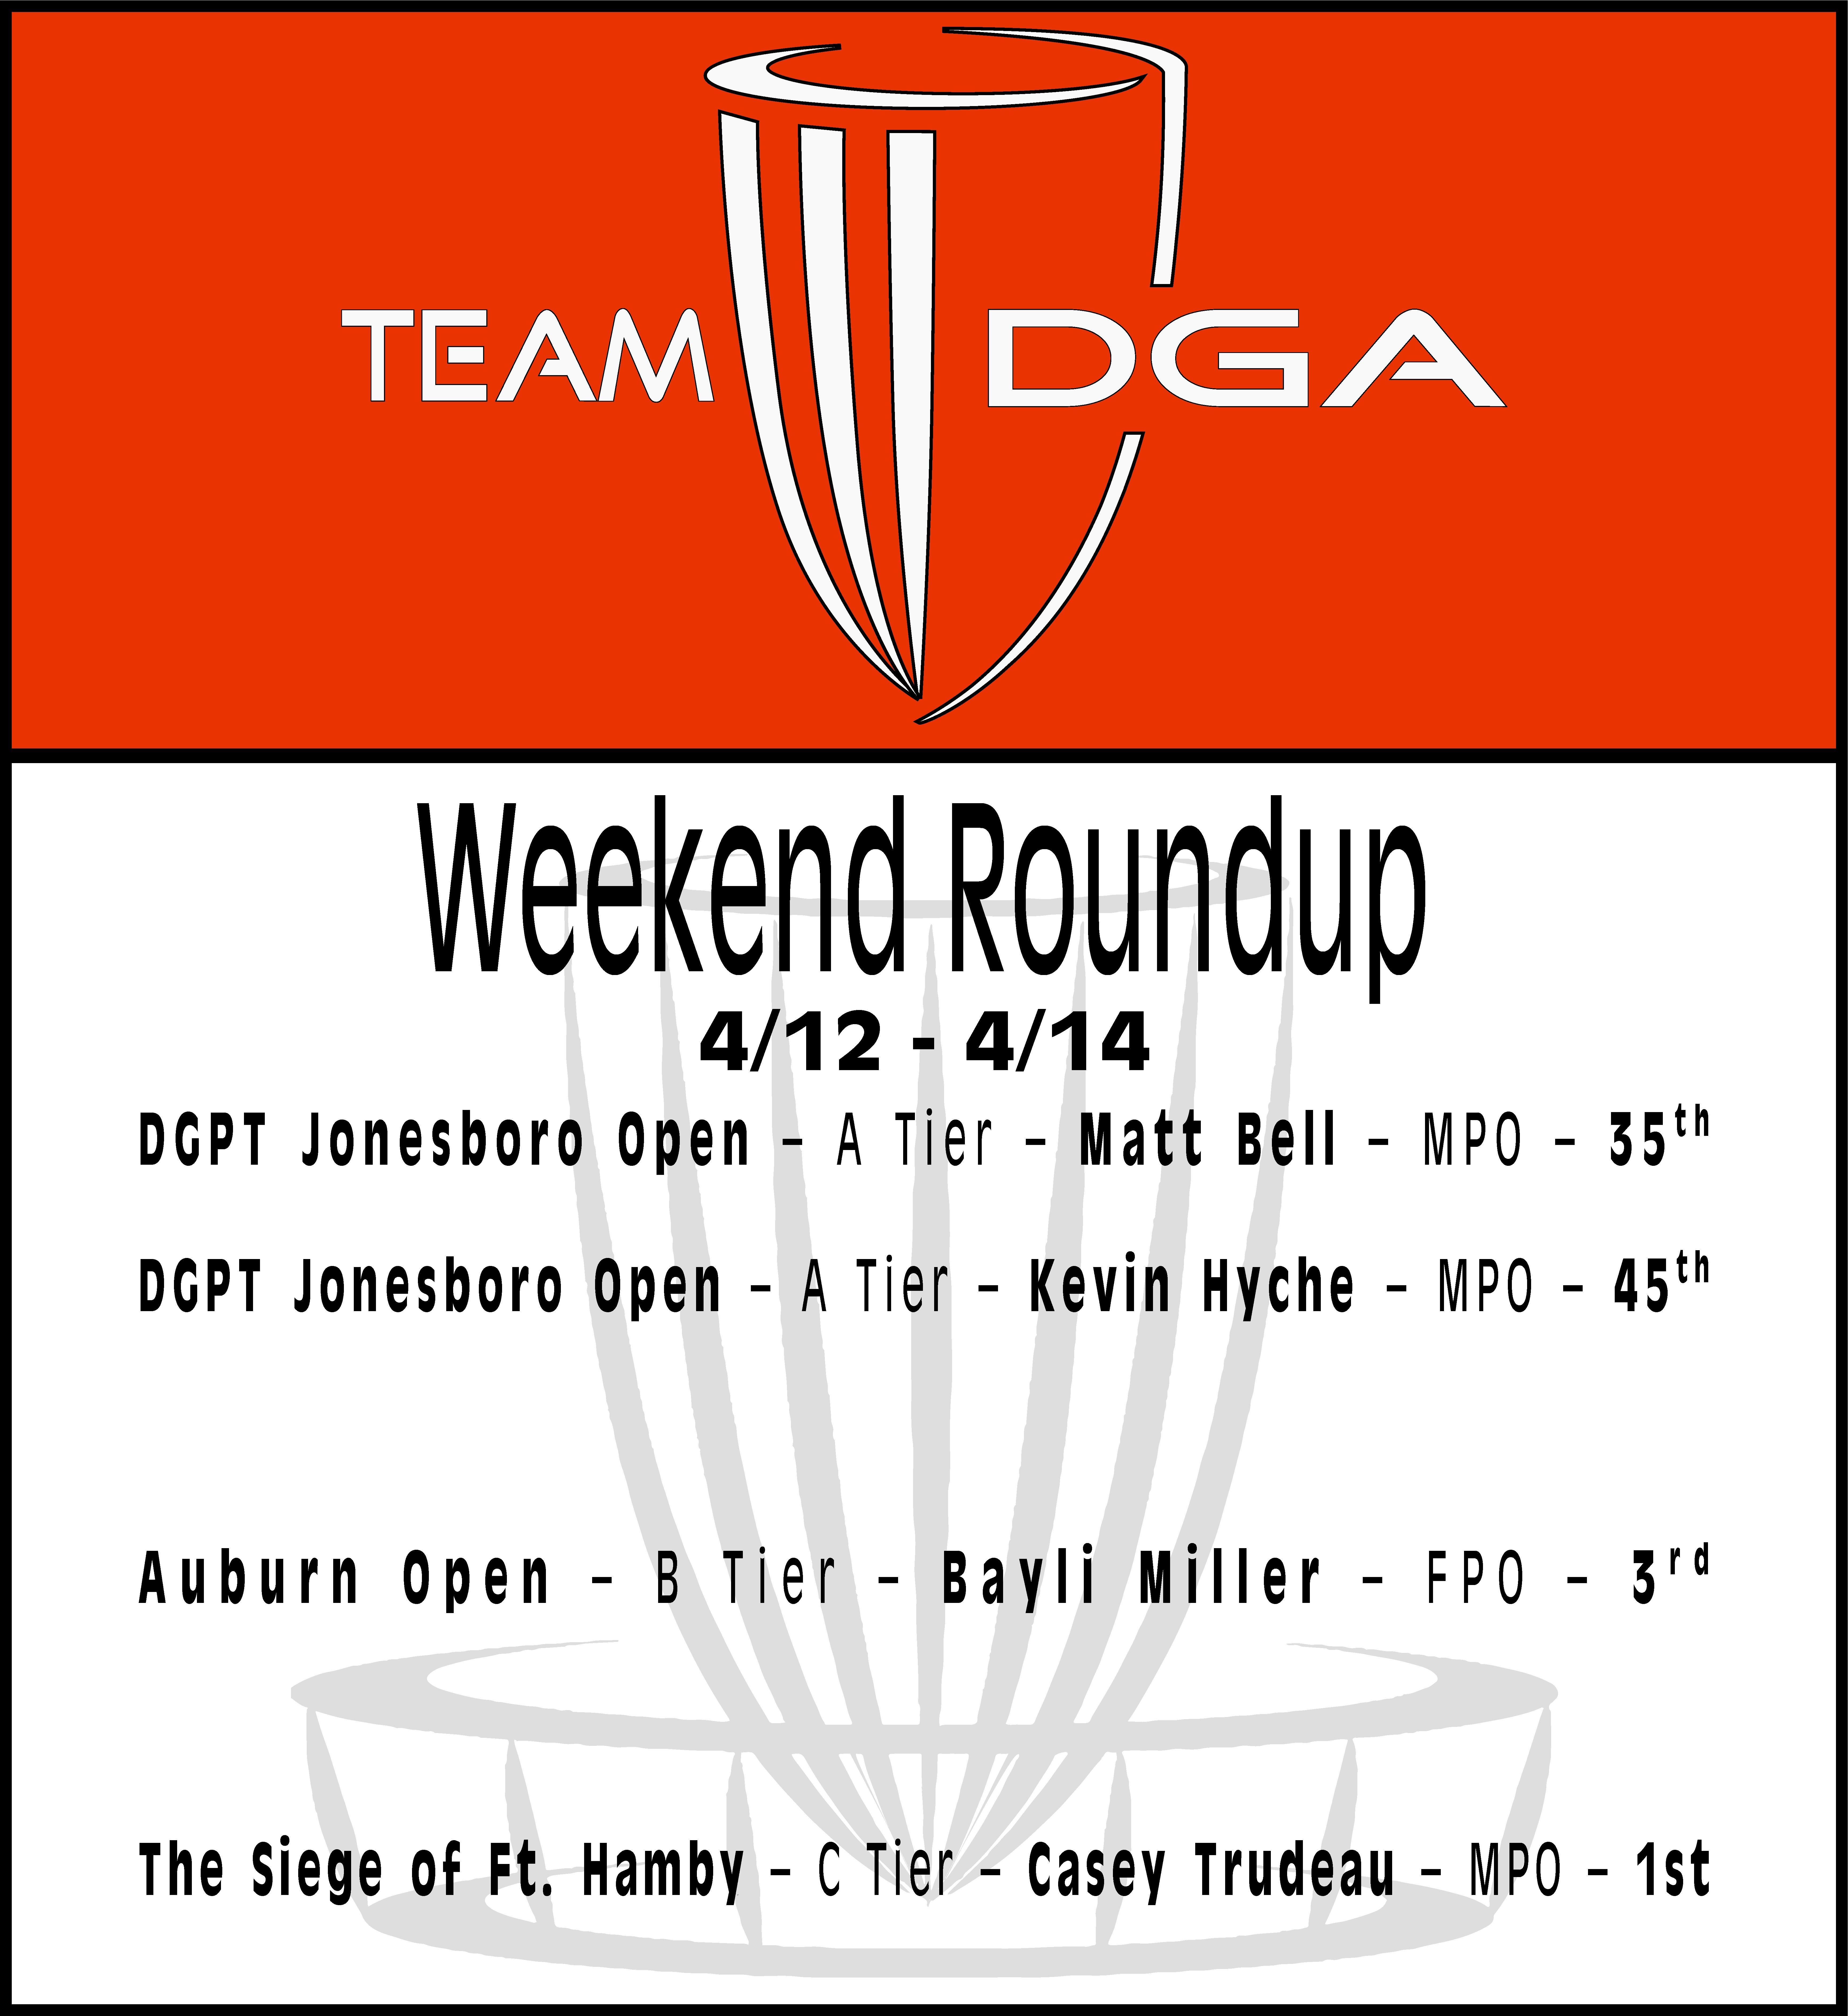 Team DGA Weekend Roundup 4/12 - 4/14